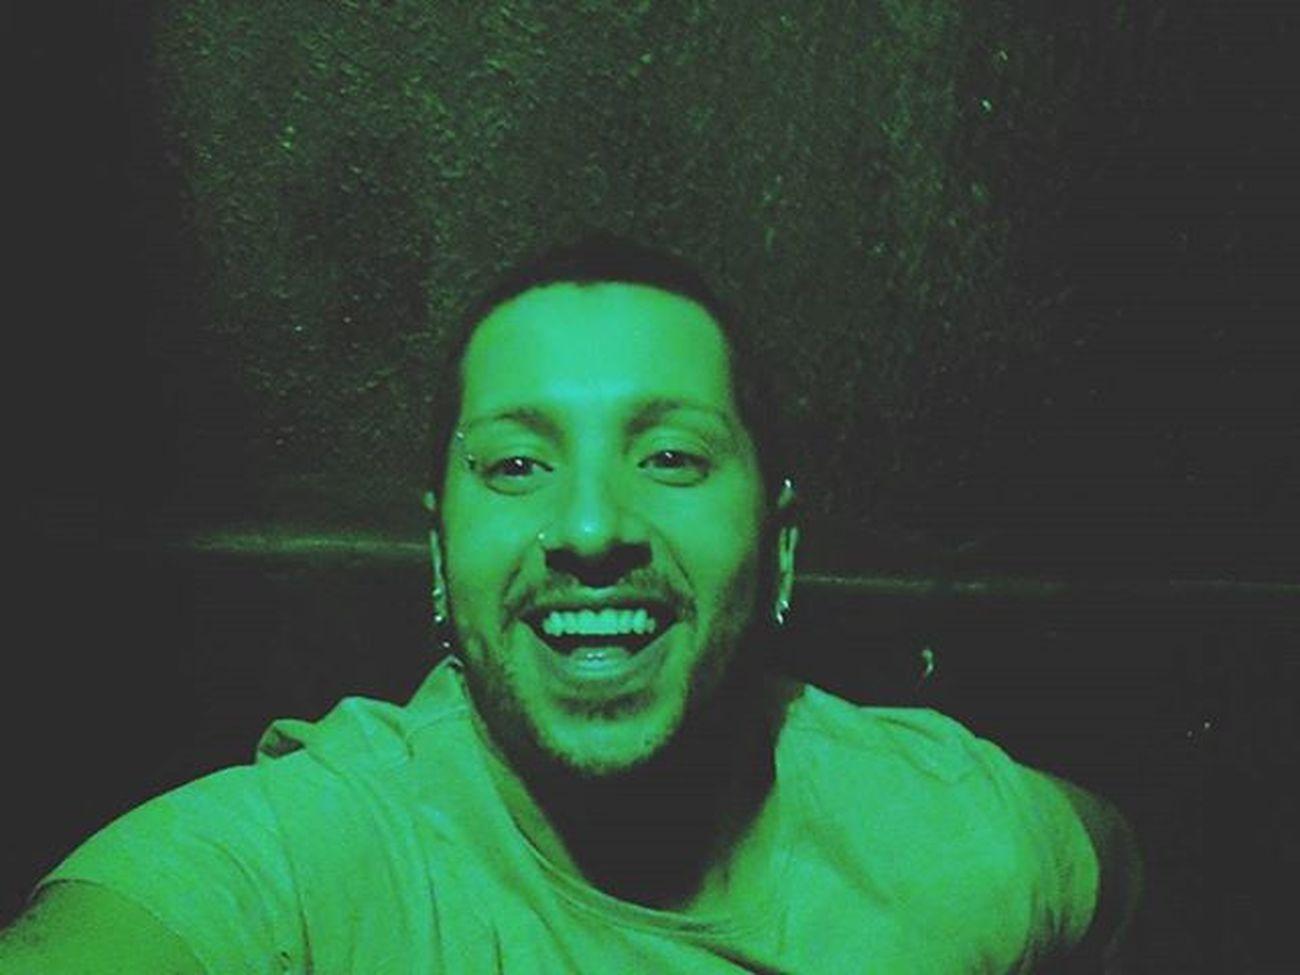 Green... Instagram Amigos Party Domingão Domingodesol Bebedeira Alcool  Cerveja Breja Beer Blackwhite Blackandwhite Me Myself Selfie Terracodoleo Freicaneca Terracodoleo Saopaulo SP Saooutrospaulos